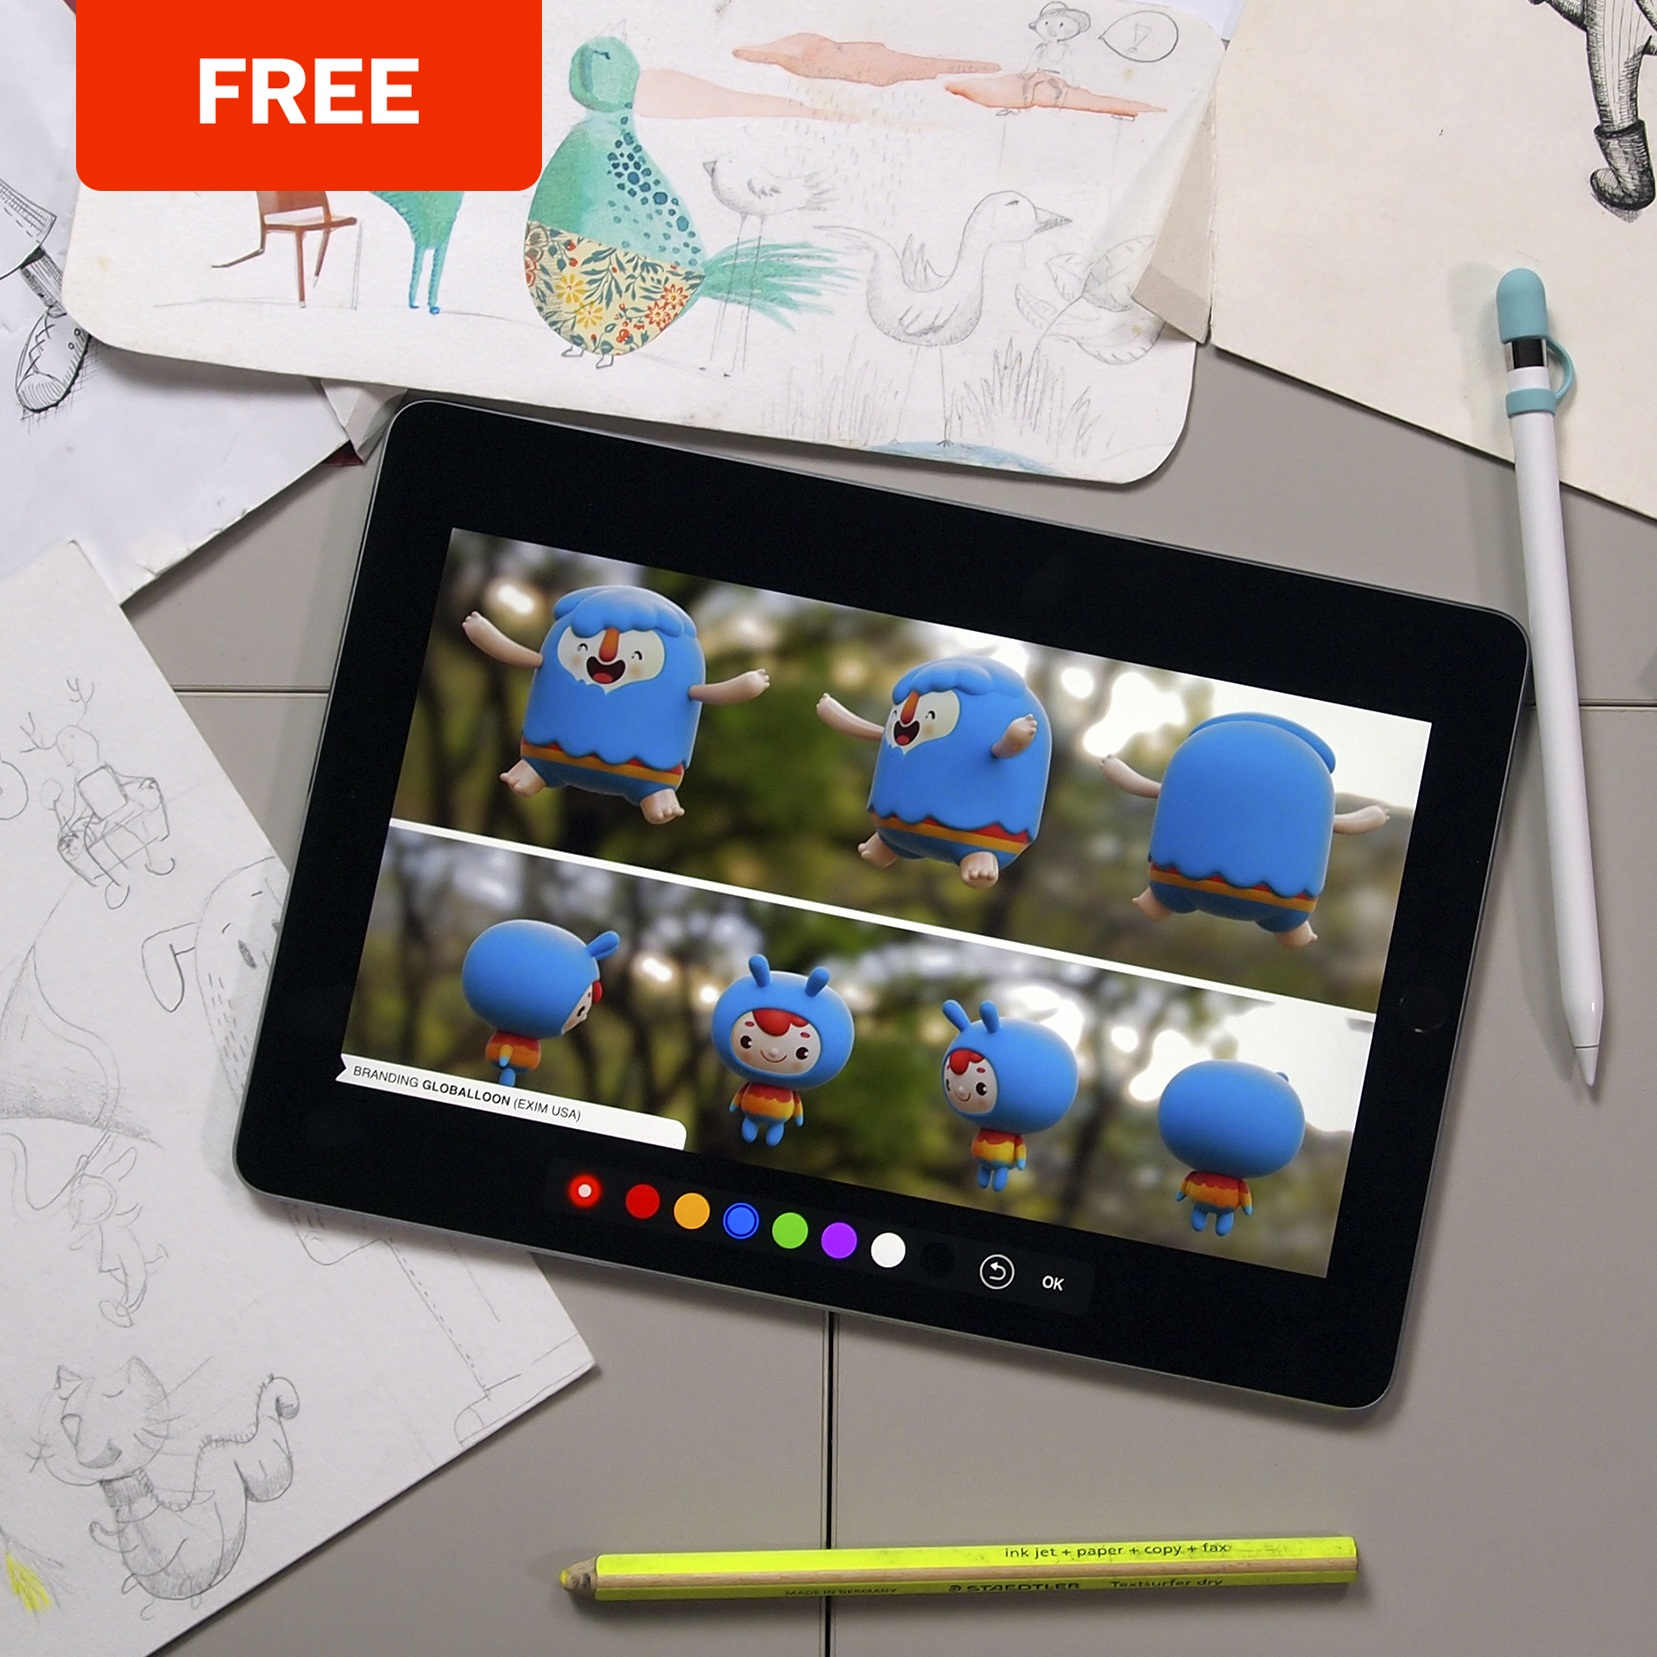 10 Free Online Design Classes for Professionals